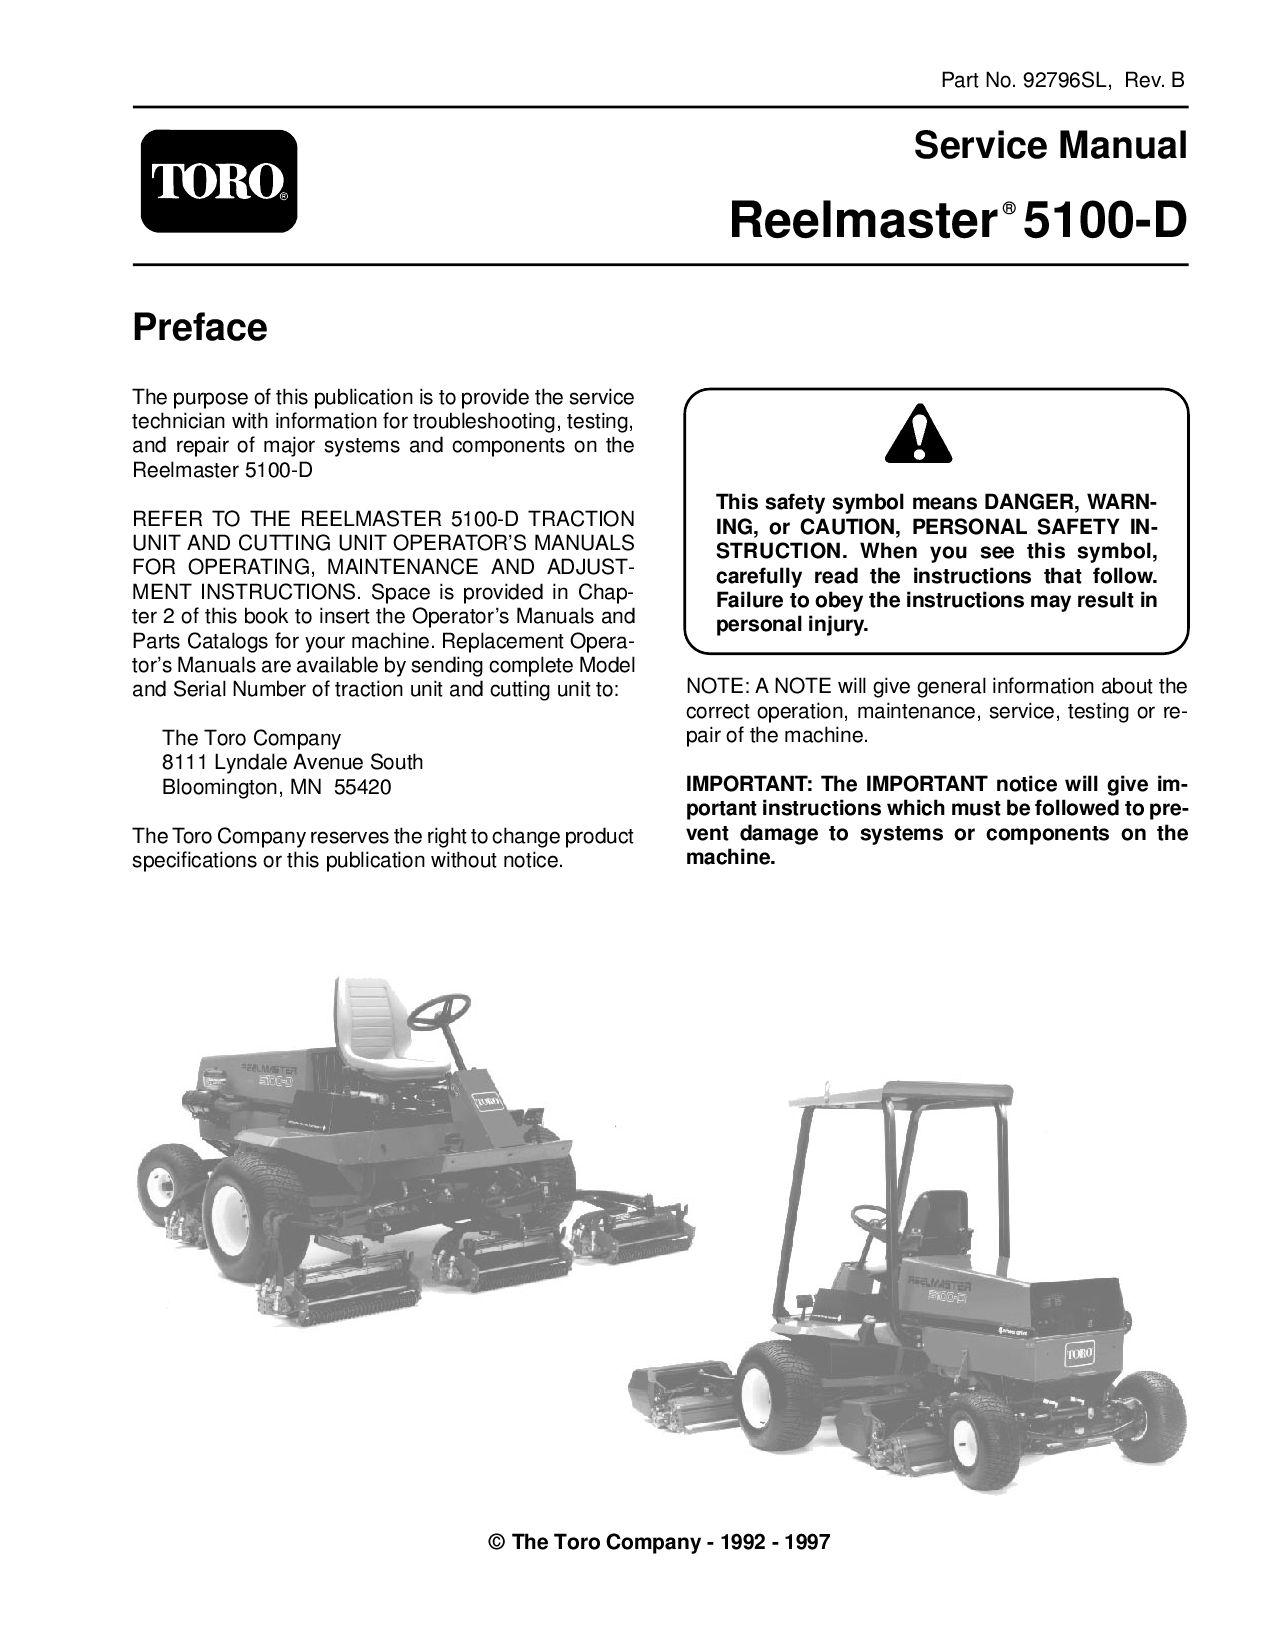 92796sl.pdf Reelmaster 5100-D (Rev B) 1997 by negimachi negimachi - issuu